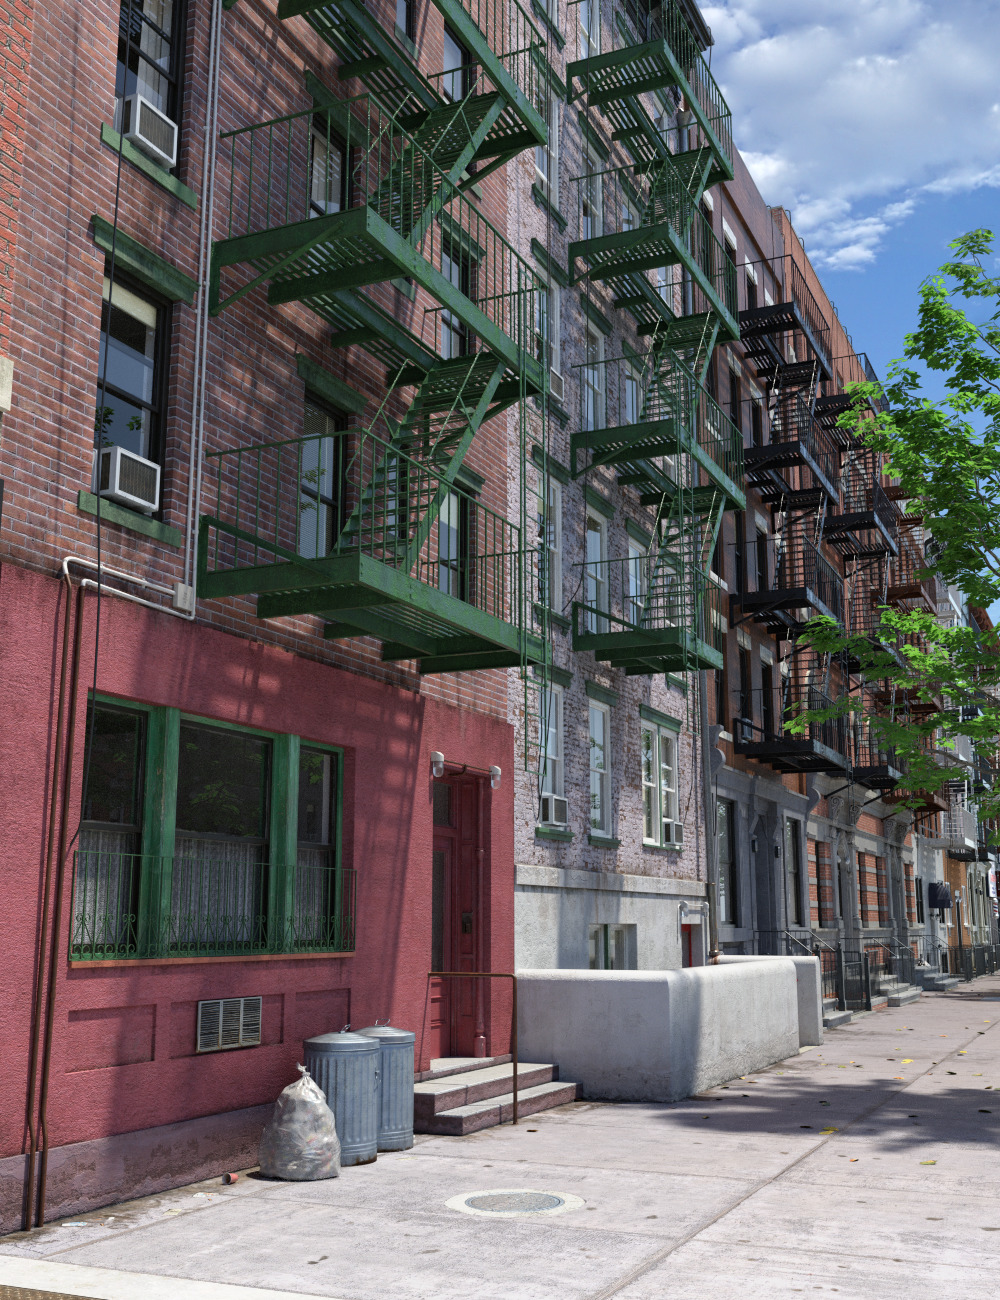 New York Tenements by: Aurelio, 3D Models by Daz 3D